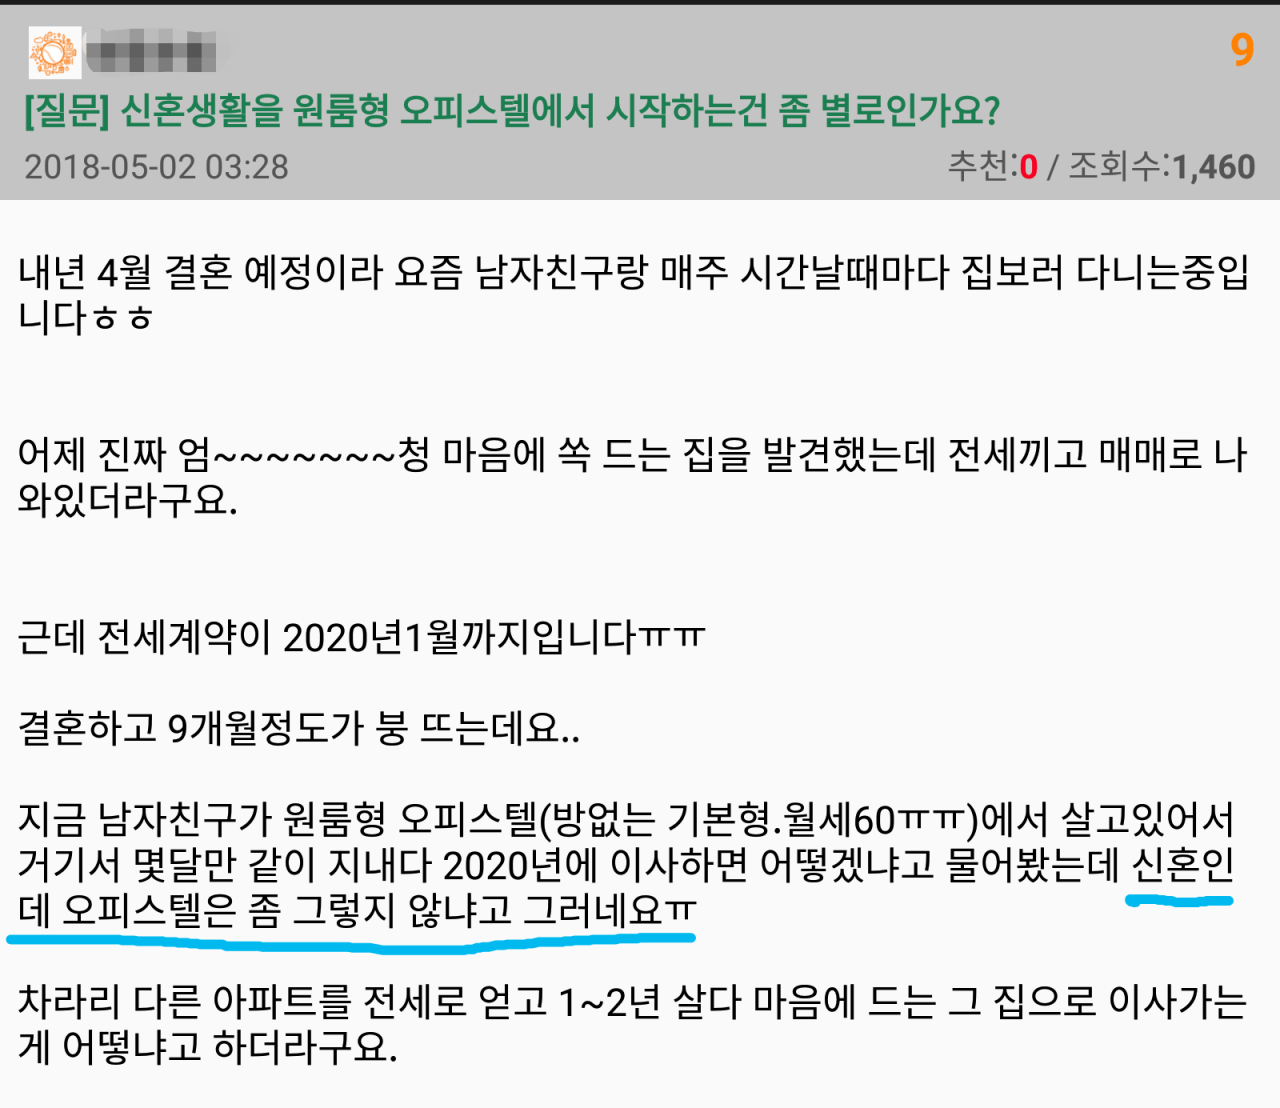 IMG_20180515_133946.png 현재 엠팍에서 댓글 500개 넘긴 예비신부 사연.jpg